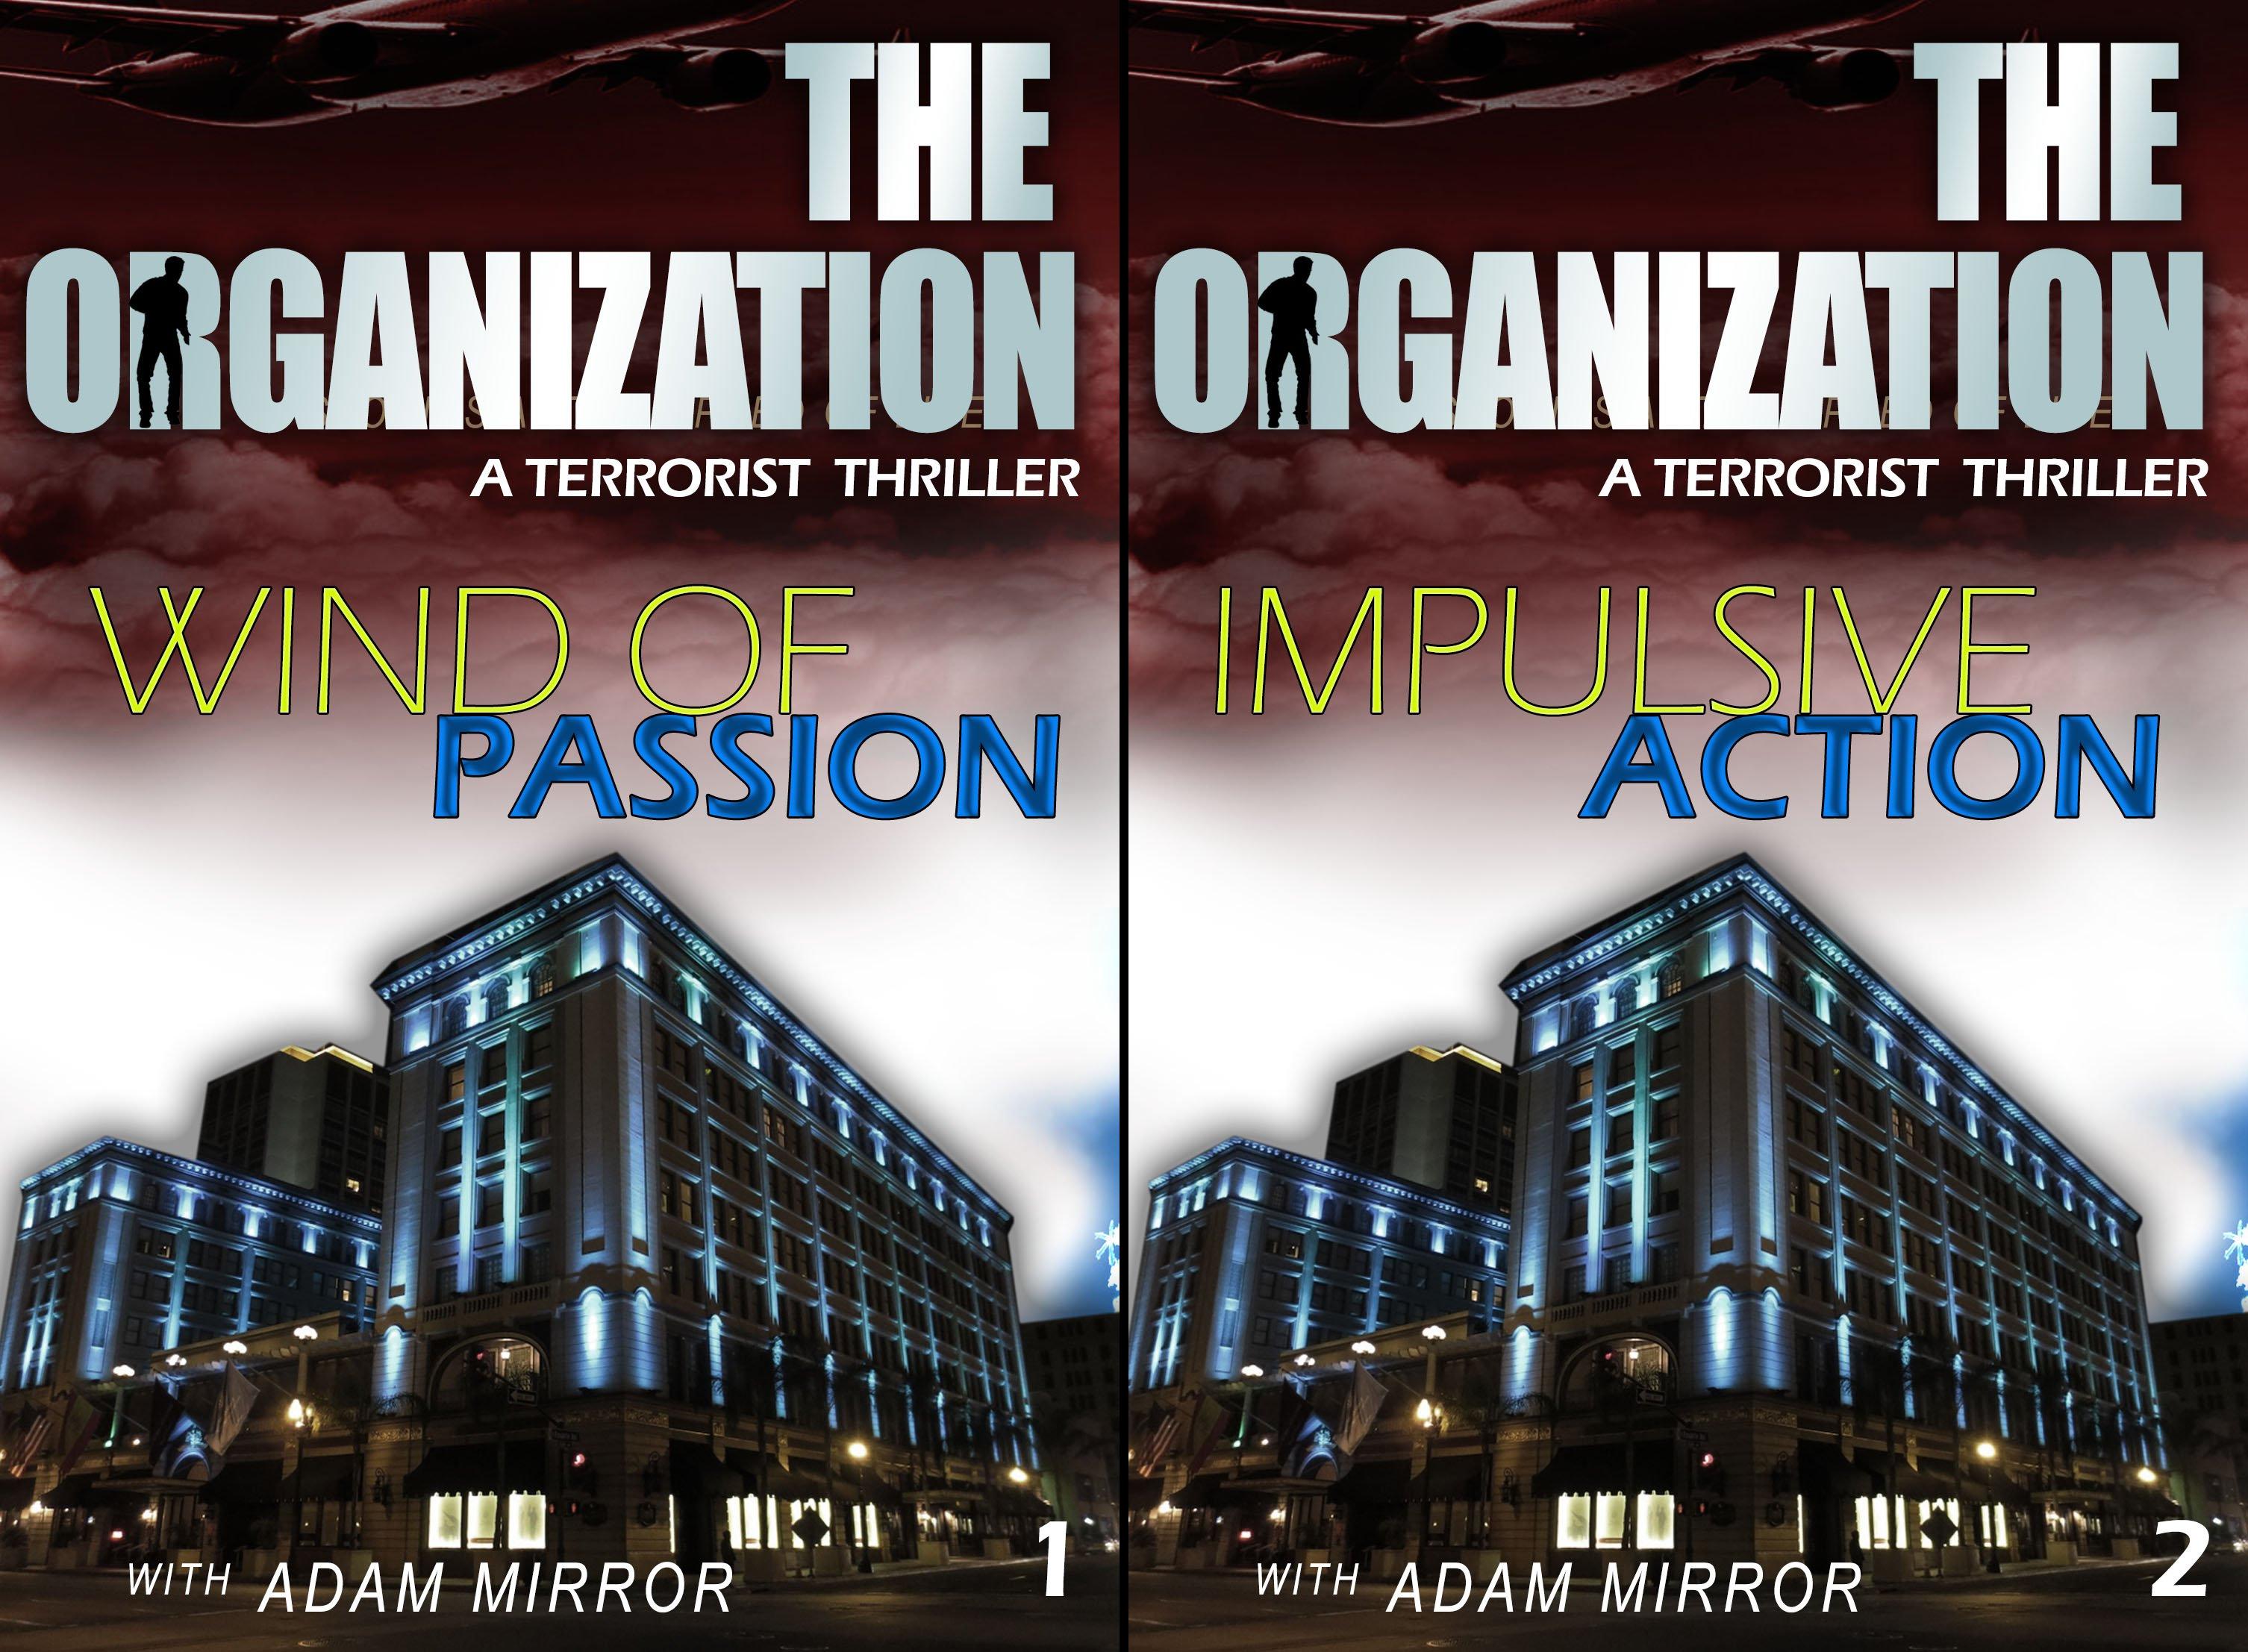 The Organization (2 Book Series)